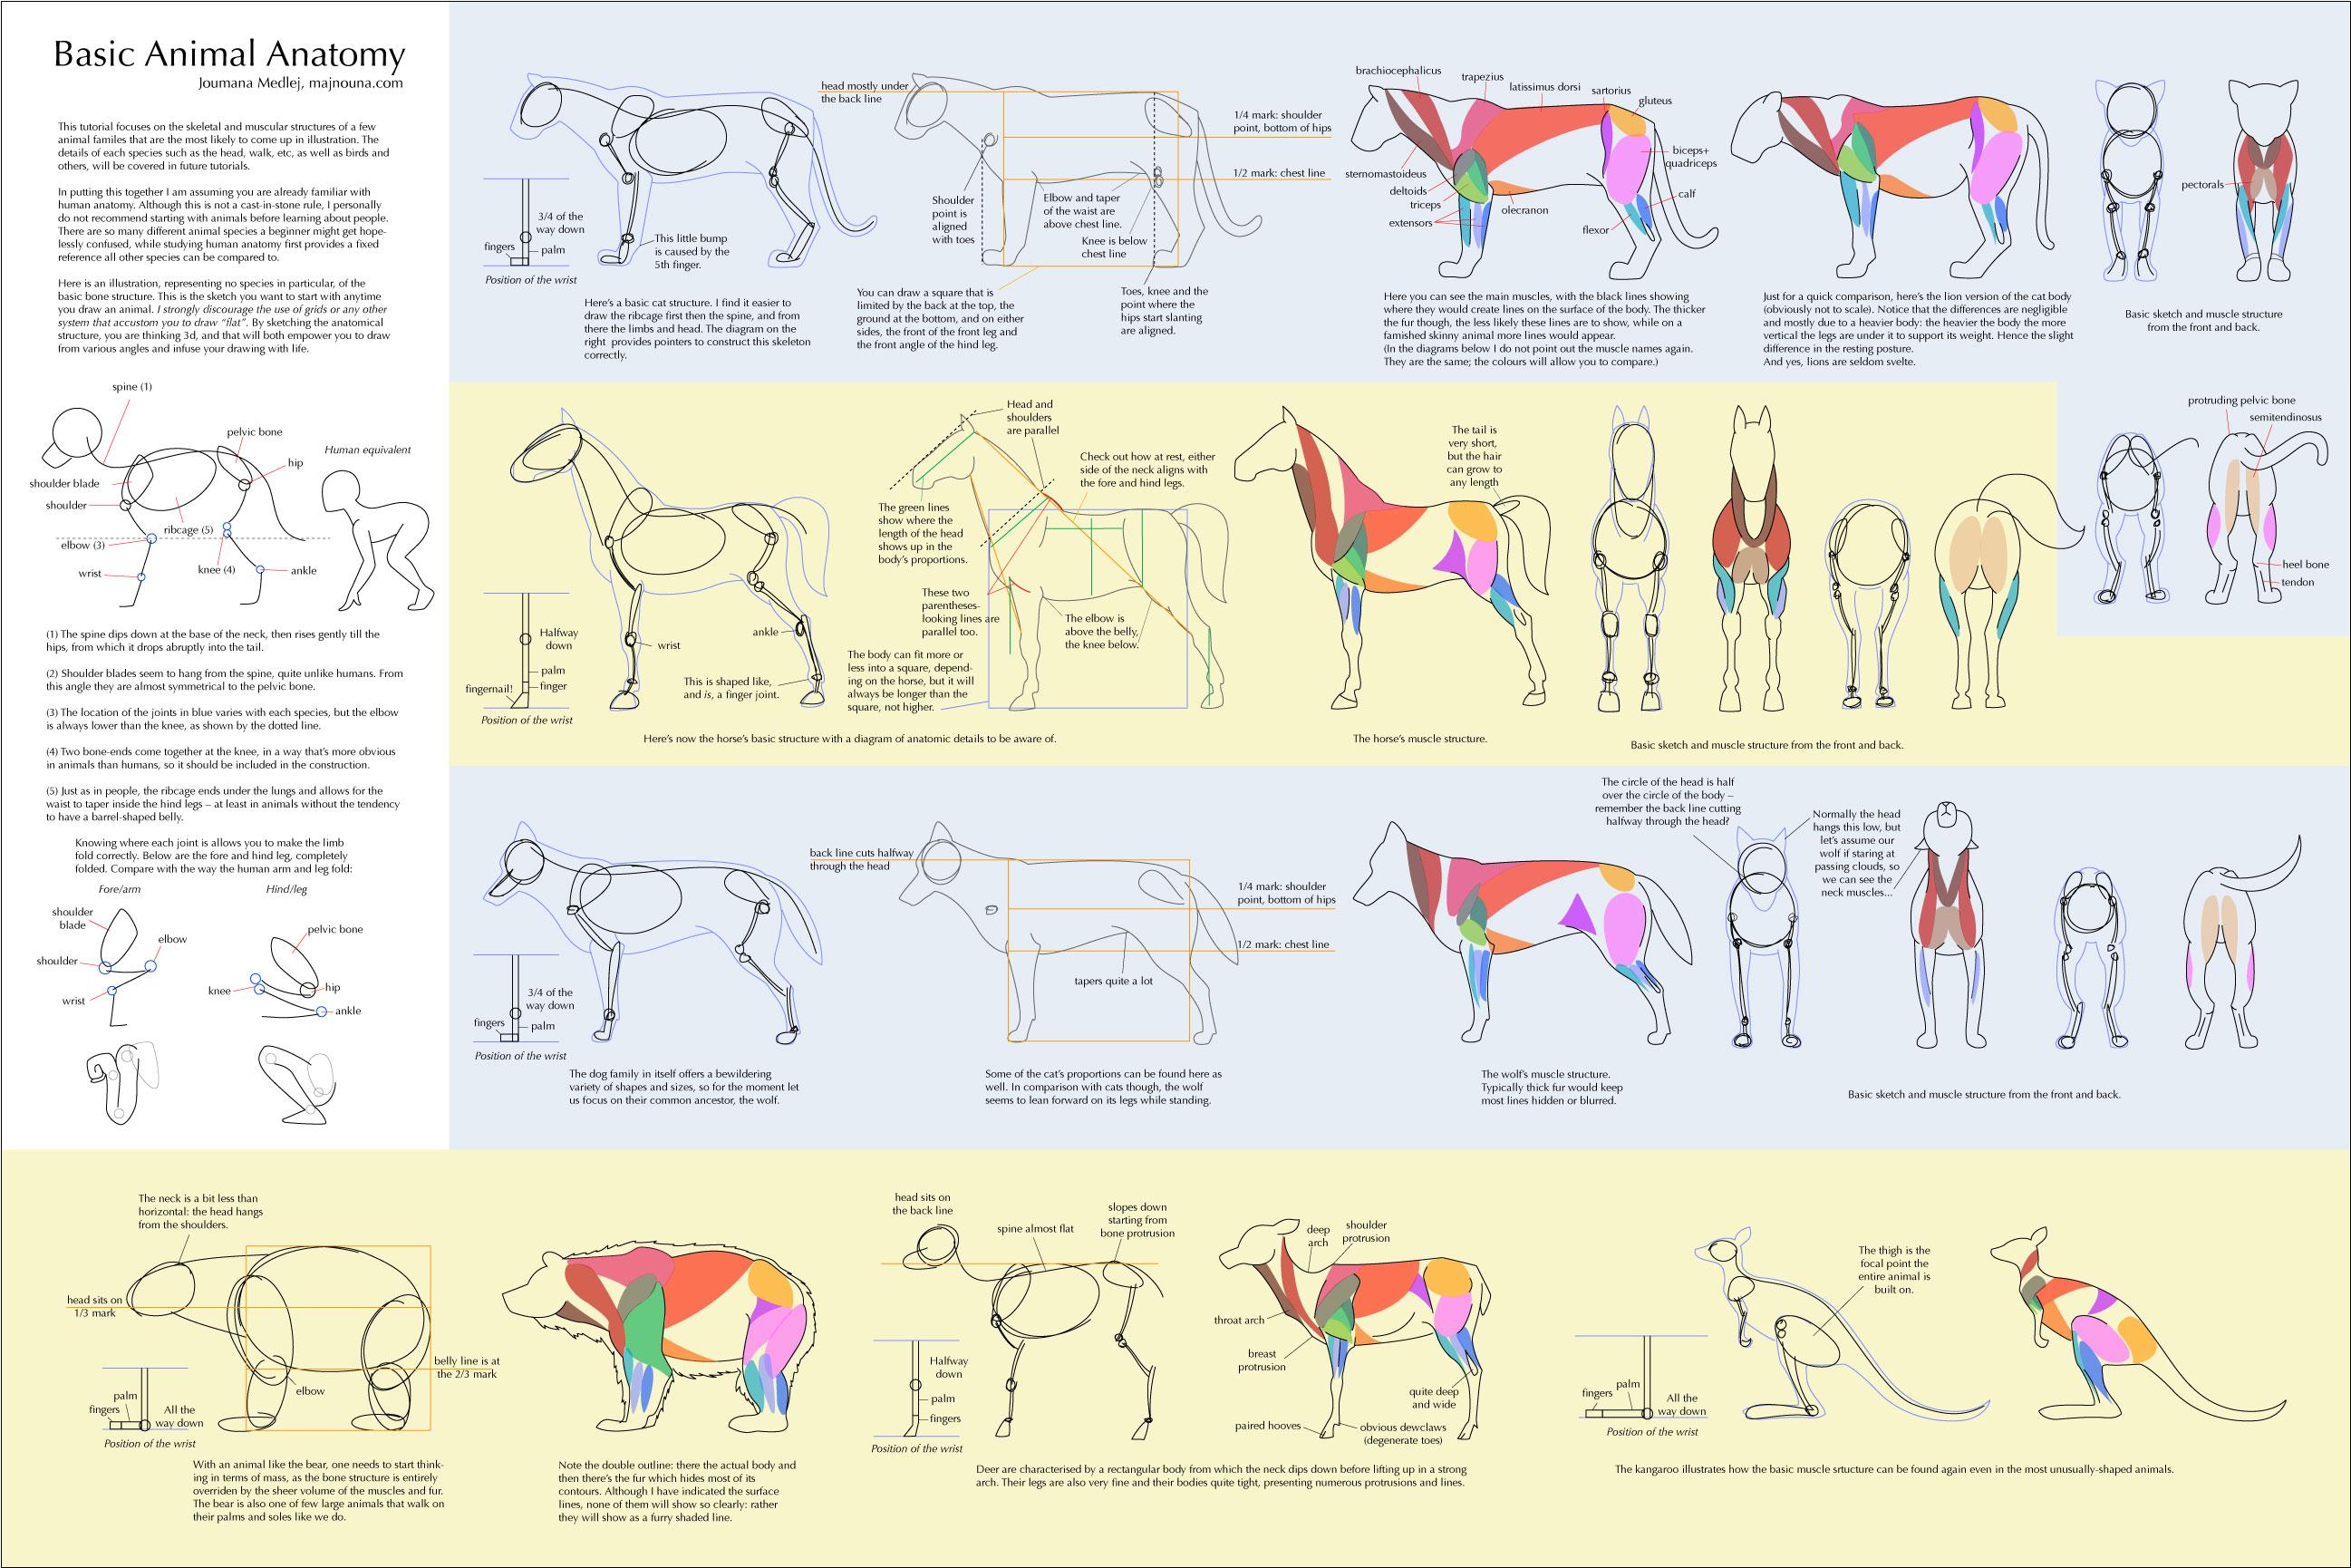 Basic Animal Anatomy by Majnouna on DeviantArt